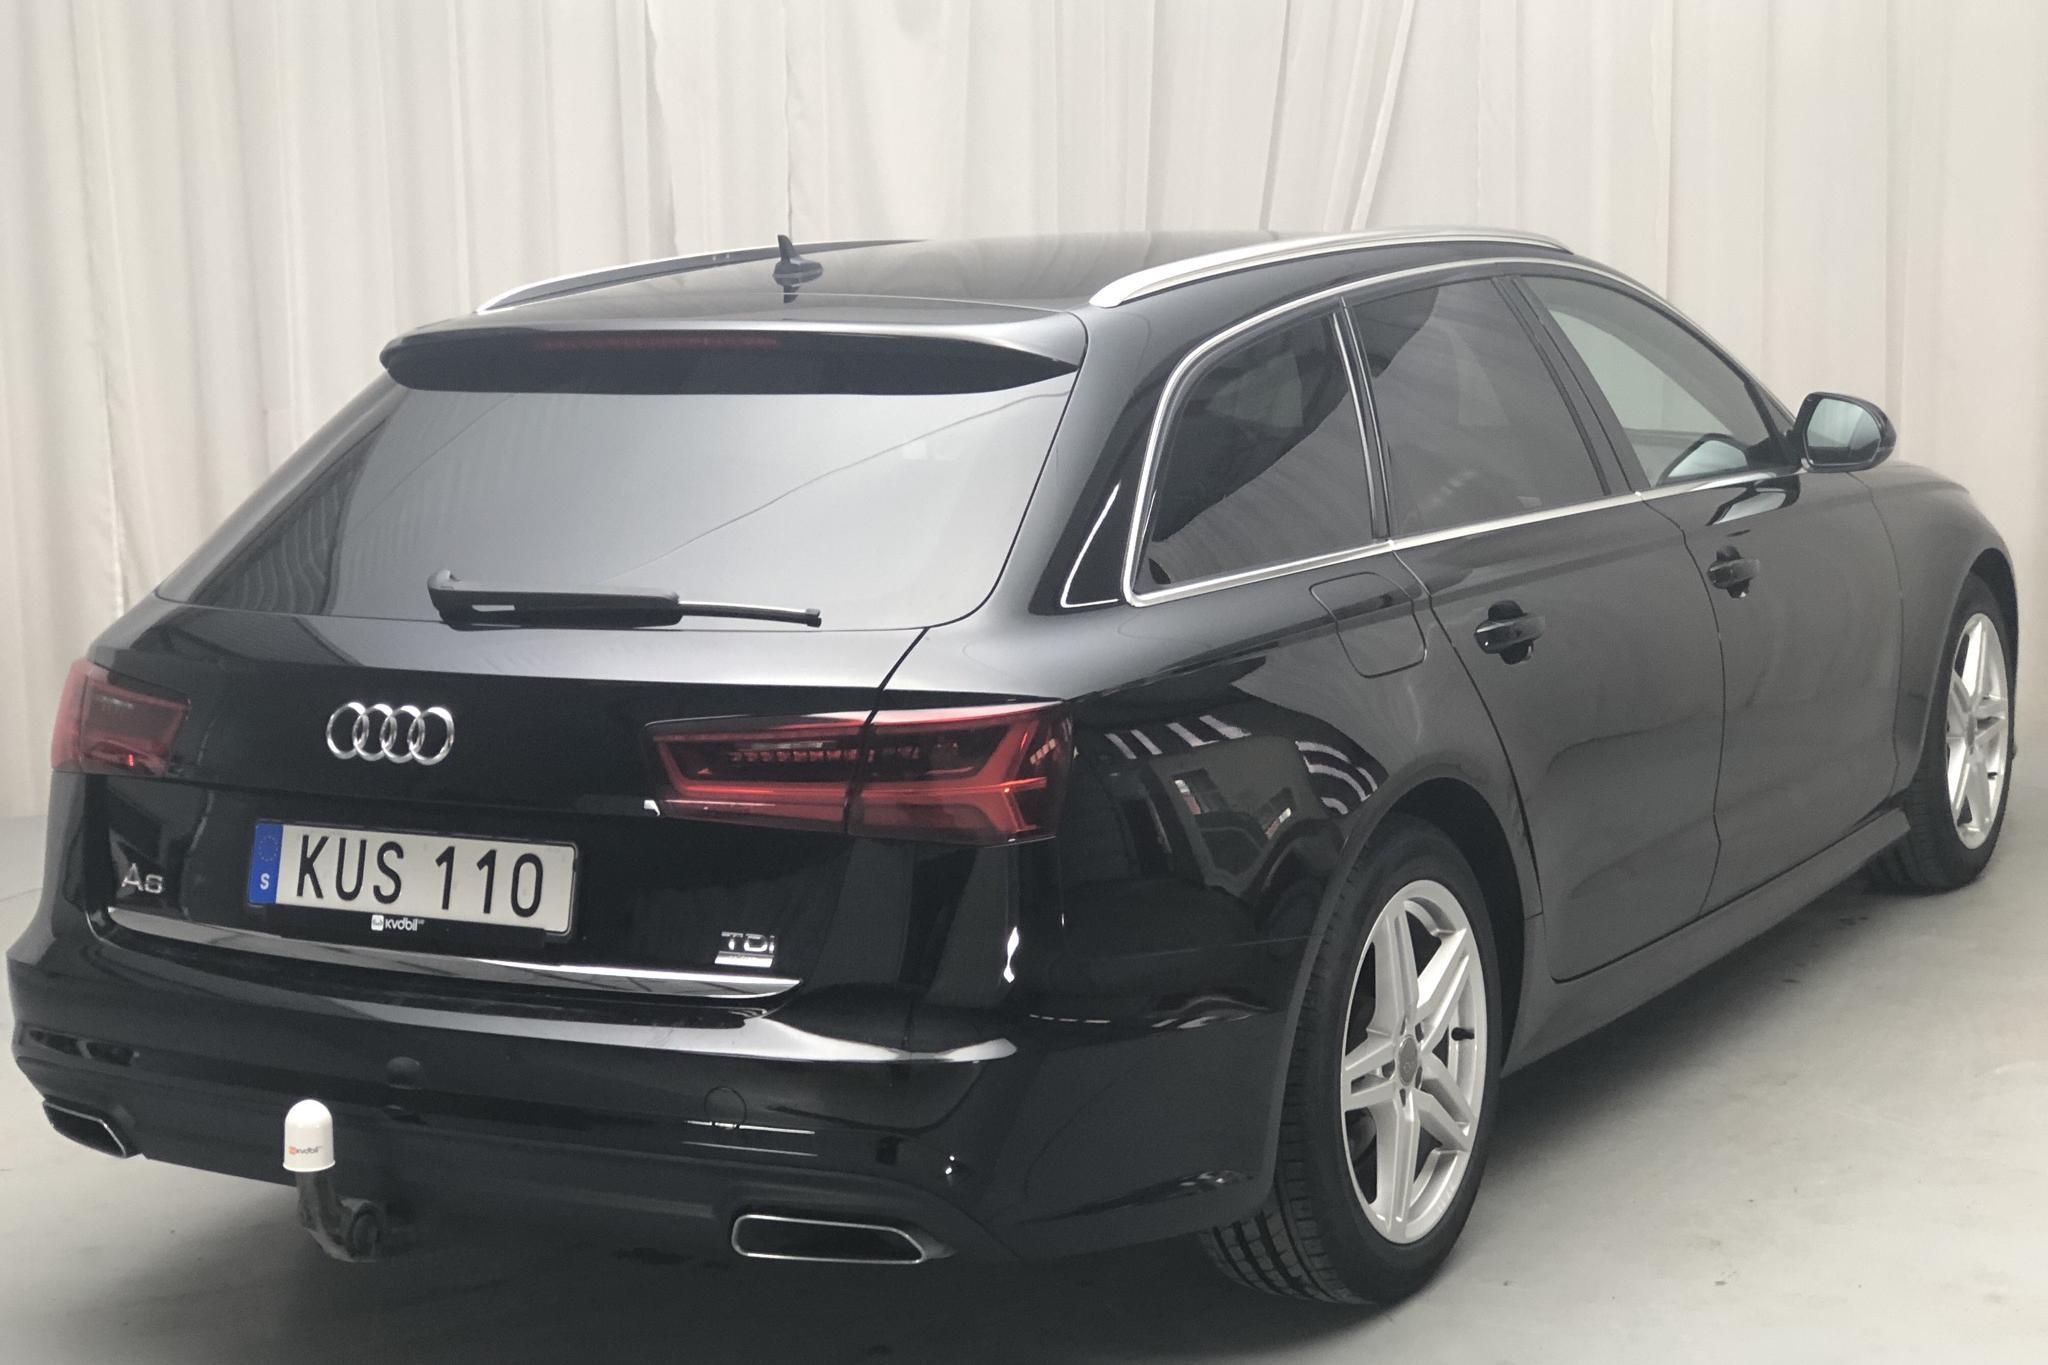 Audi A6 2.0 TDI Avant (190hk) - 49 750 km - Automatic - black - 2018